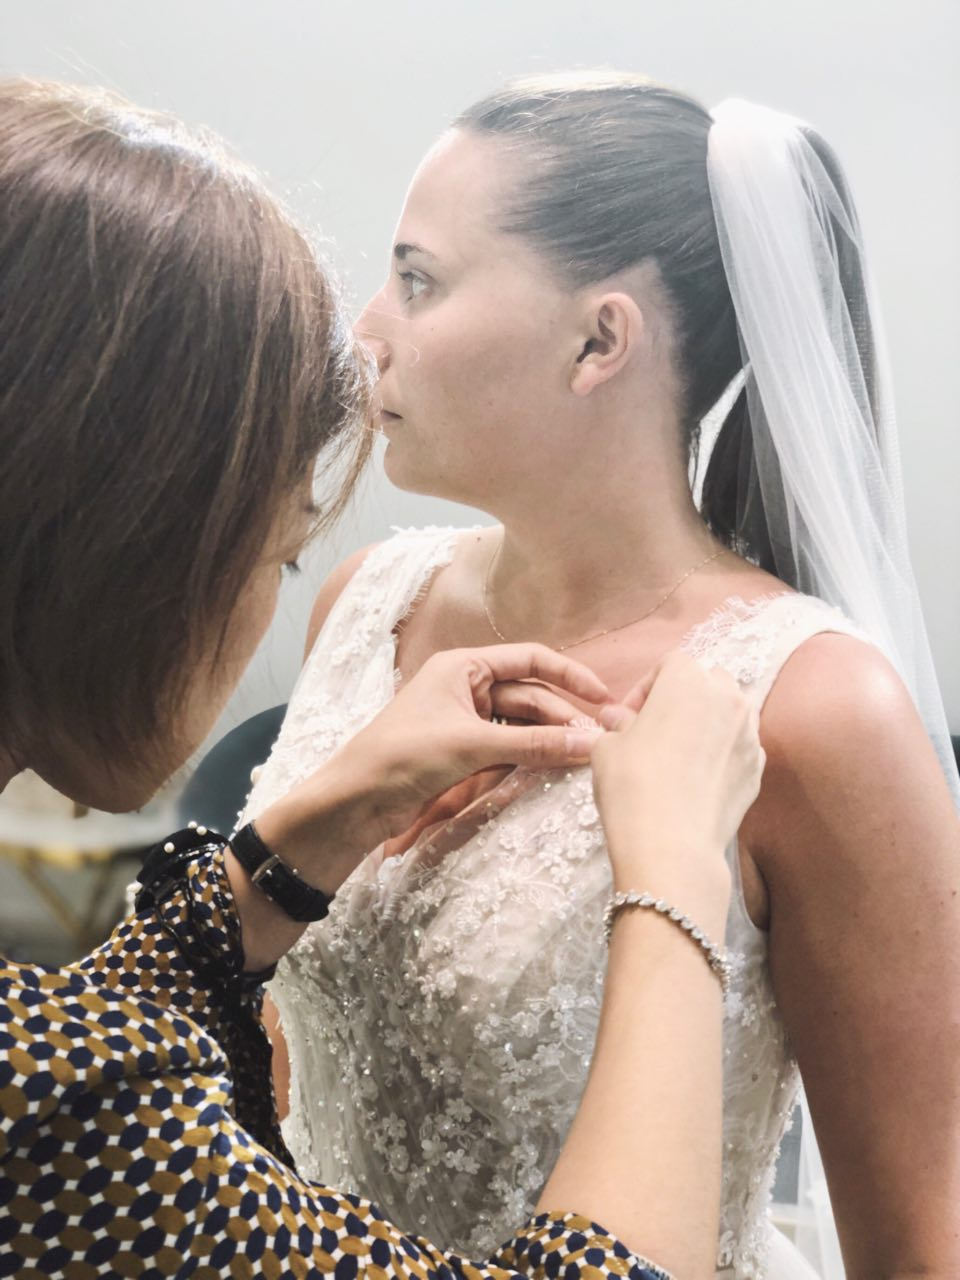 lace+wedding+dress+pleat+embellished+ccm+bride.jpg